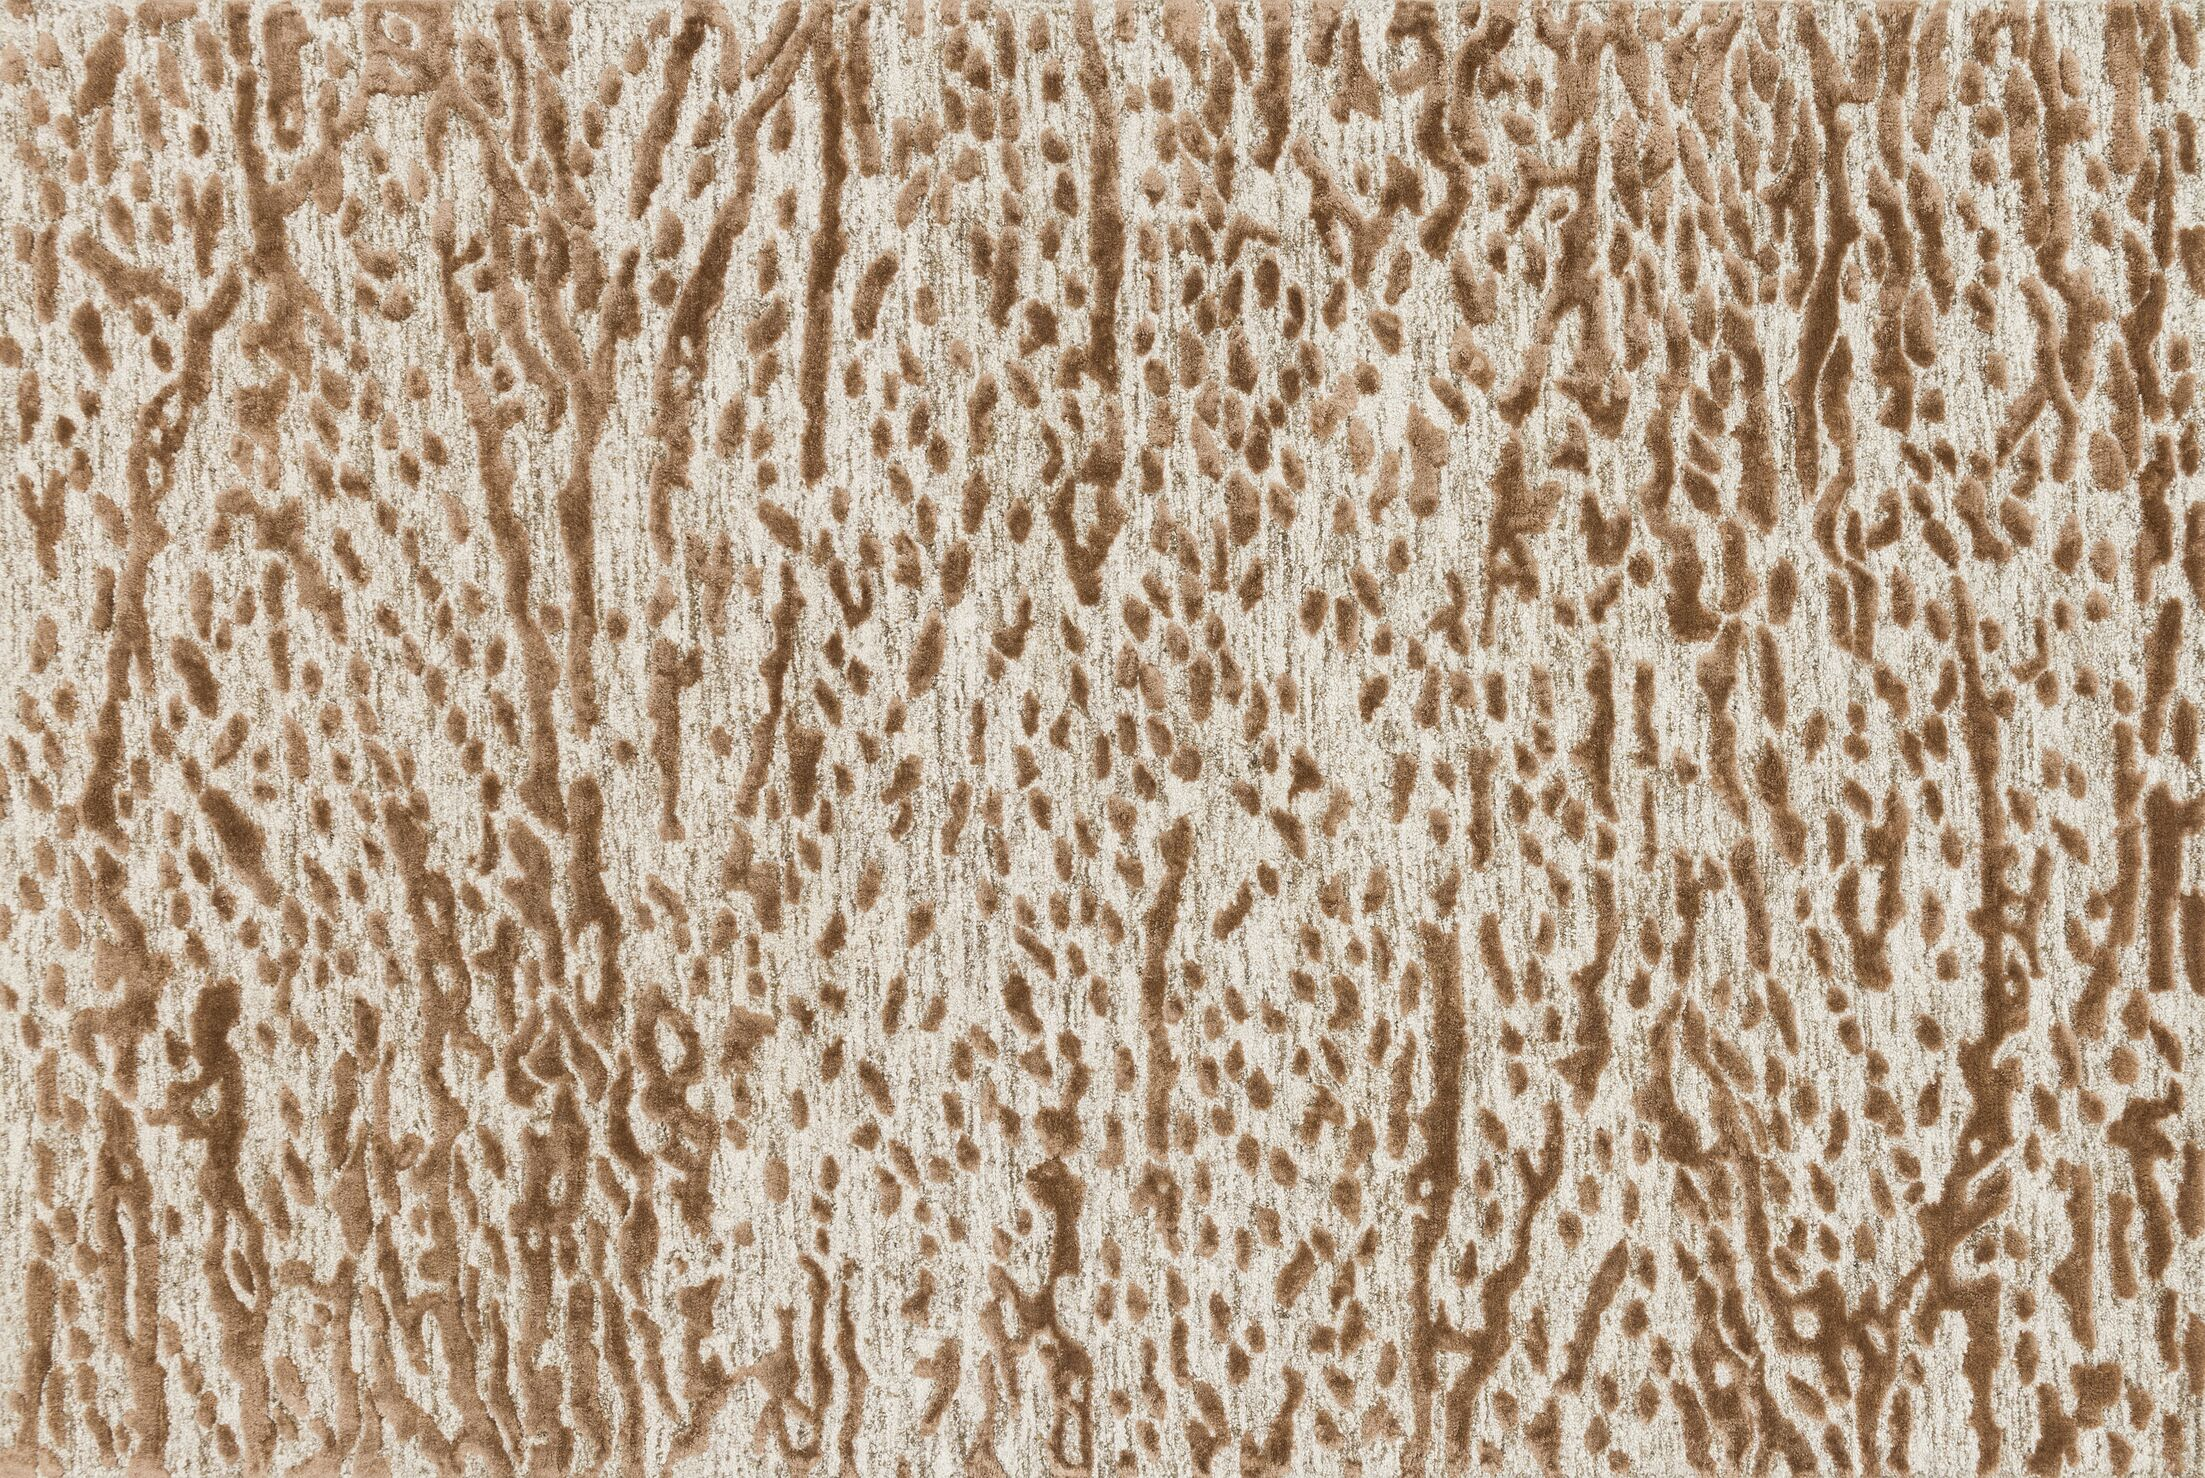 Rusch Hand-Tufted Oatmeal/Terracotta Area Rug Rug Size: Rectangle 9'3